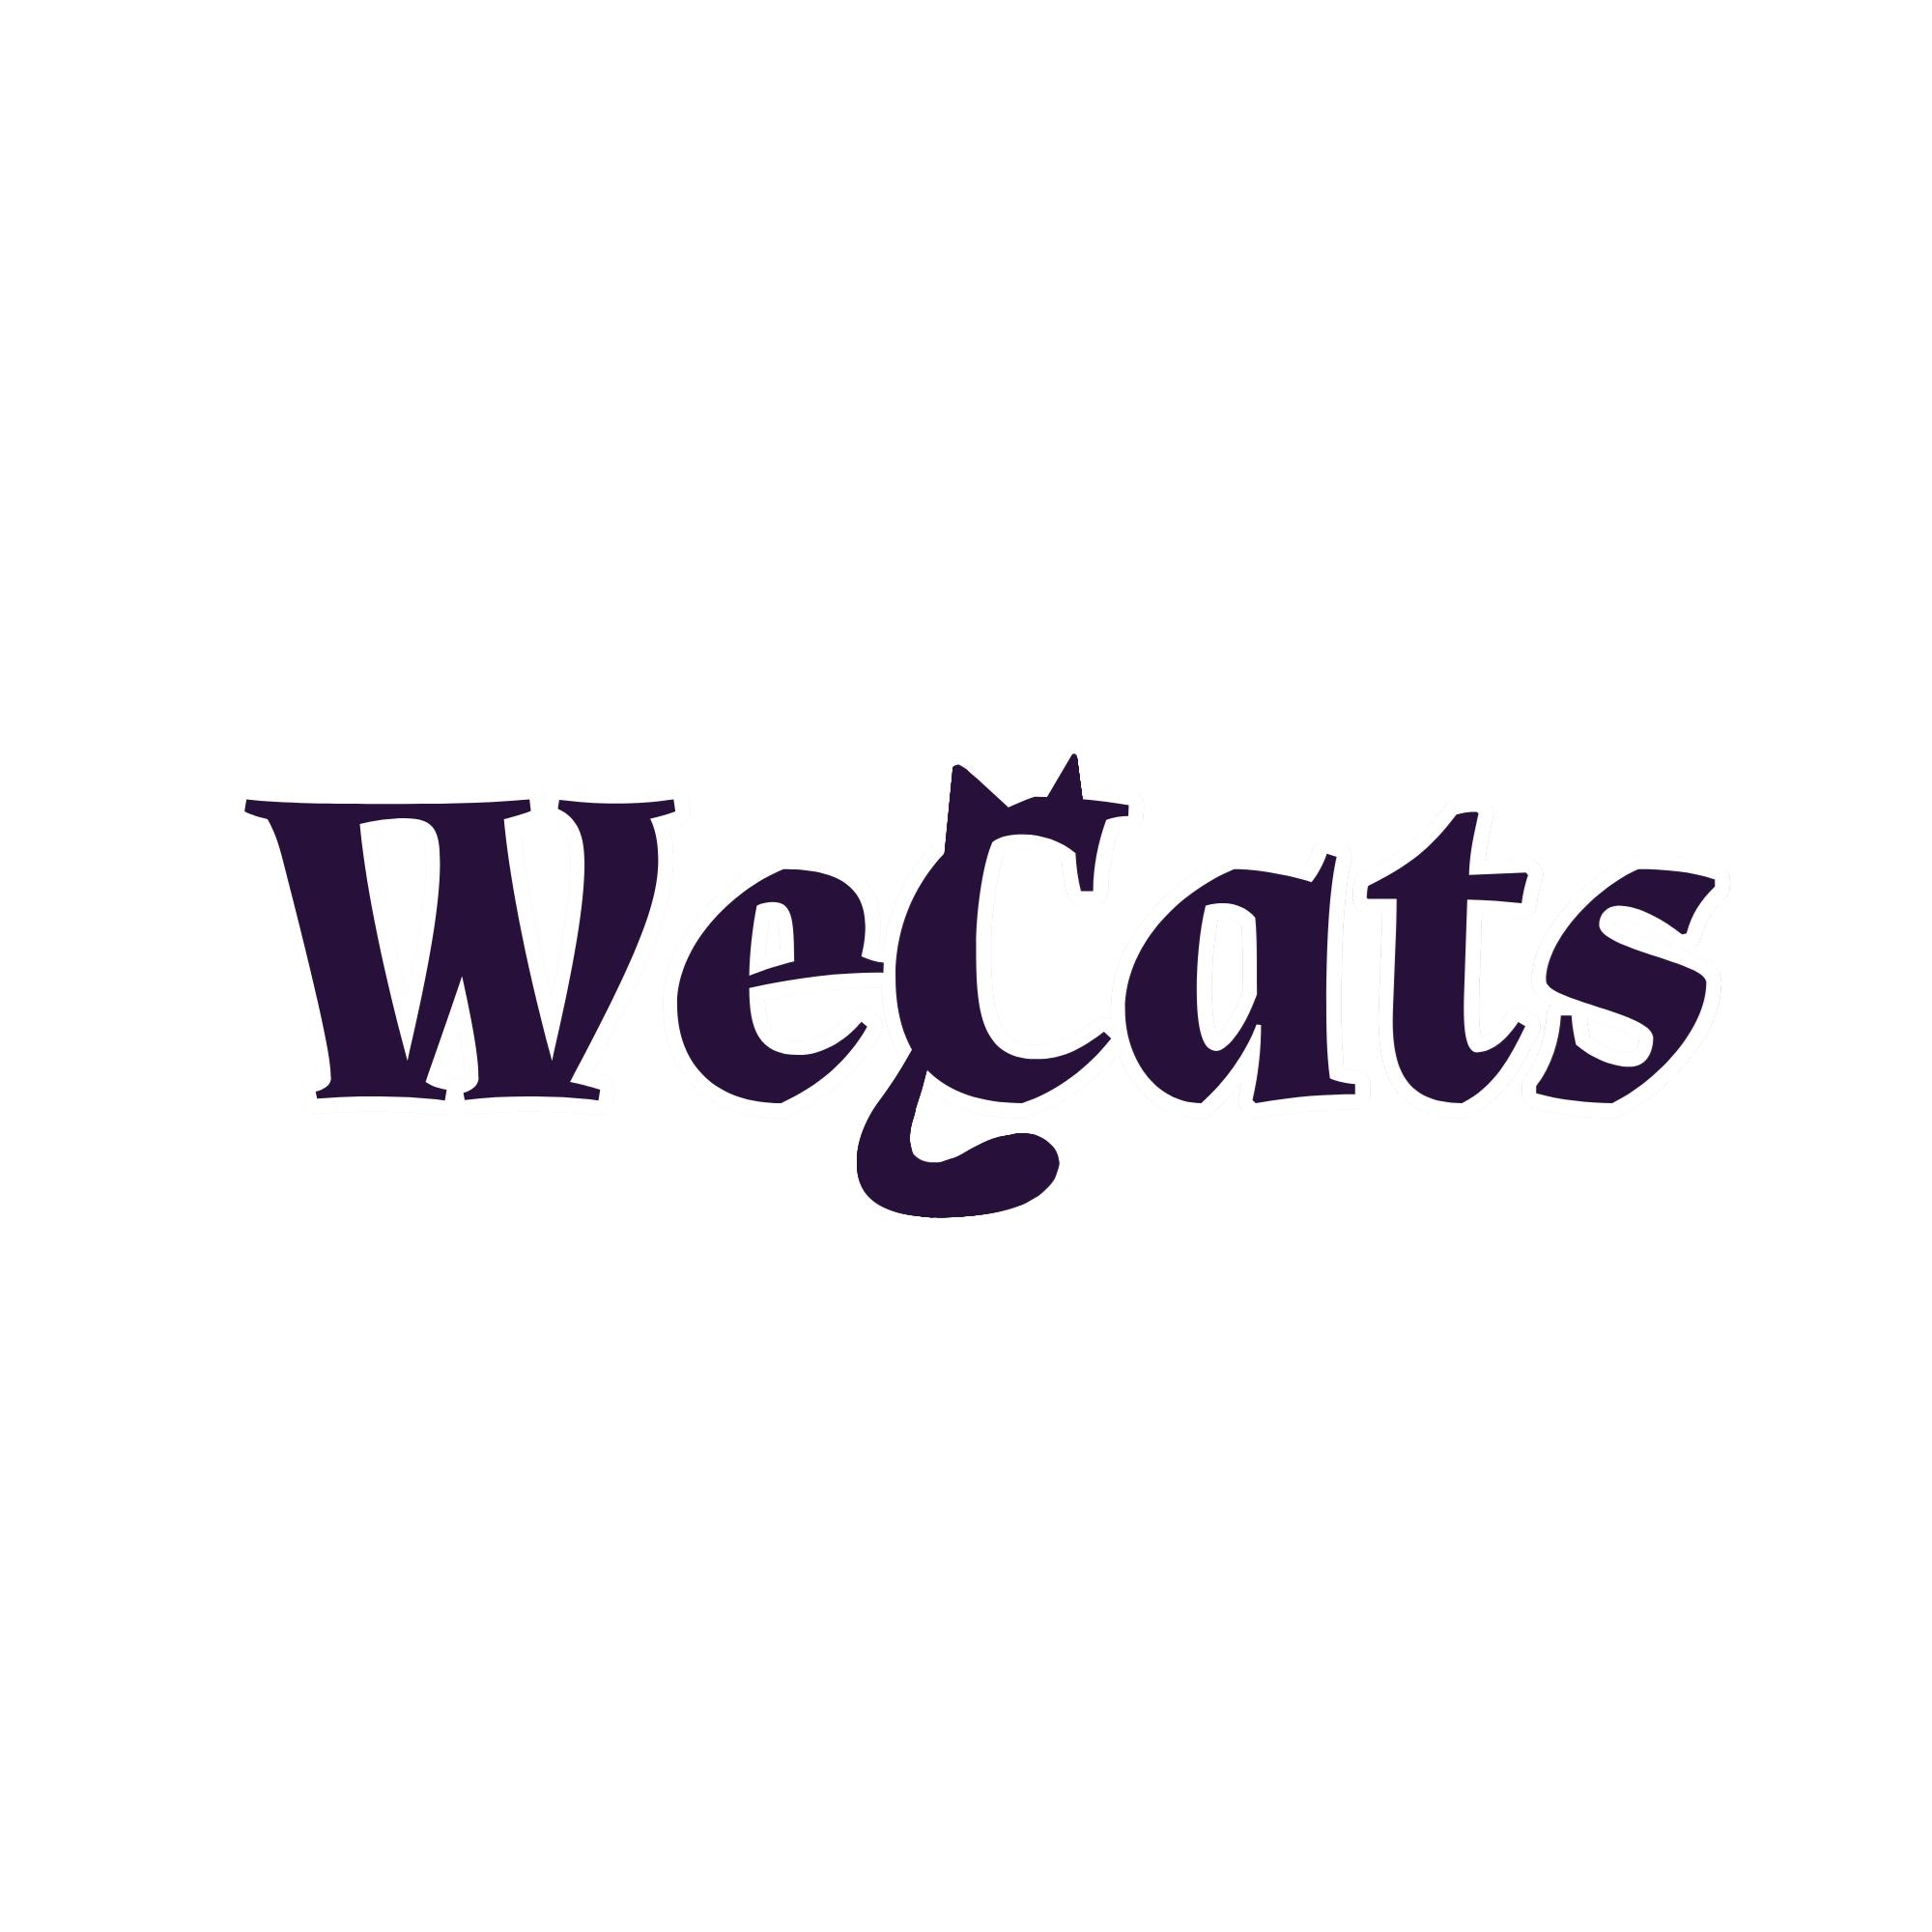 Создание логотипа WeCats фото f_5165f196f591eb75.jpg